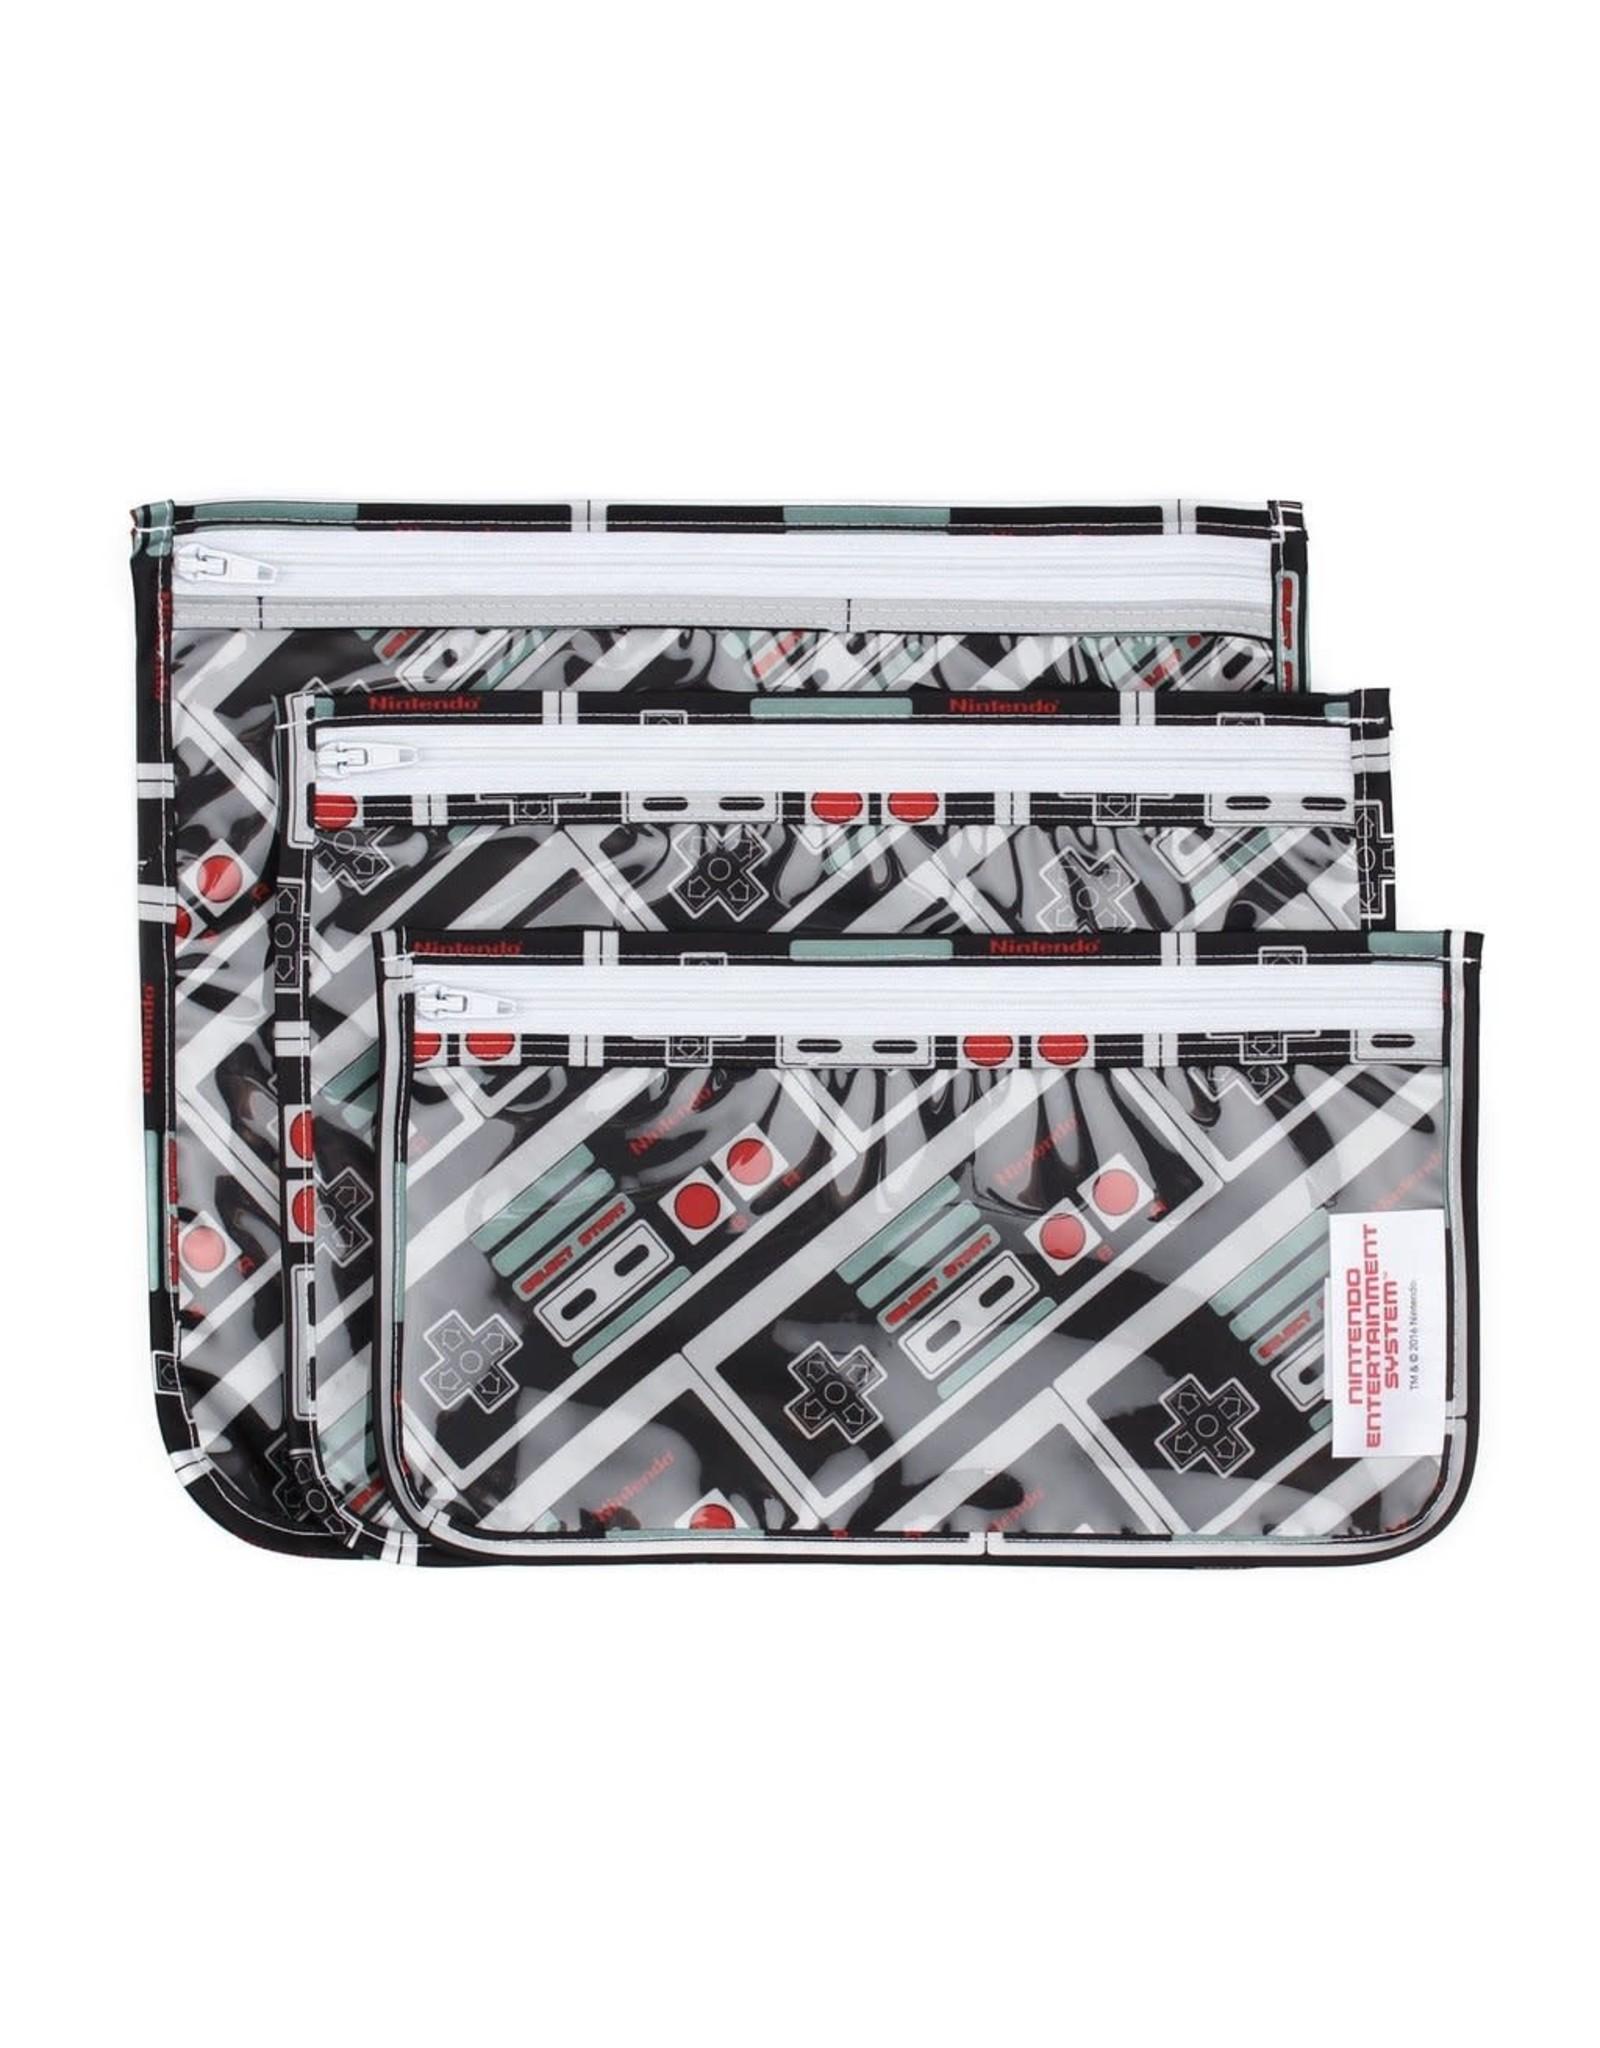 Bumkins Nintendo Clear Travel Bag